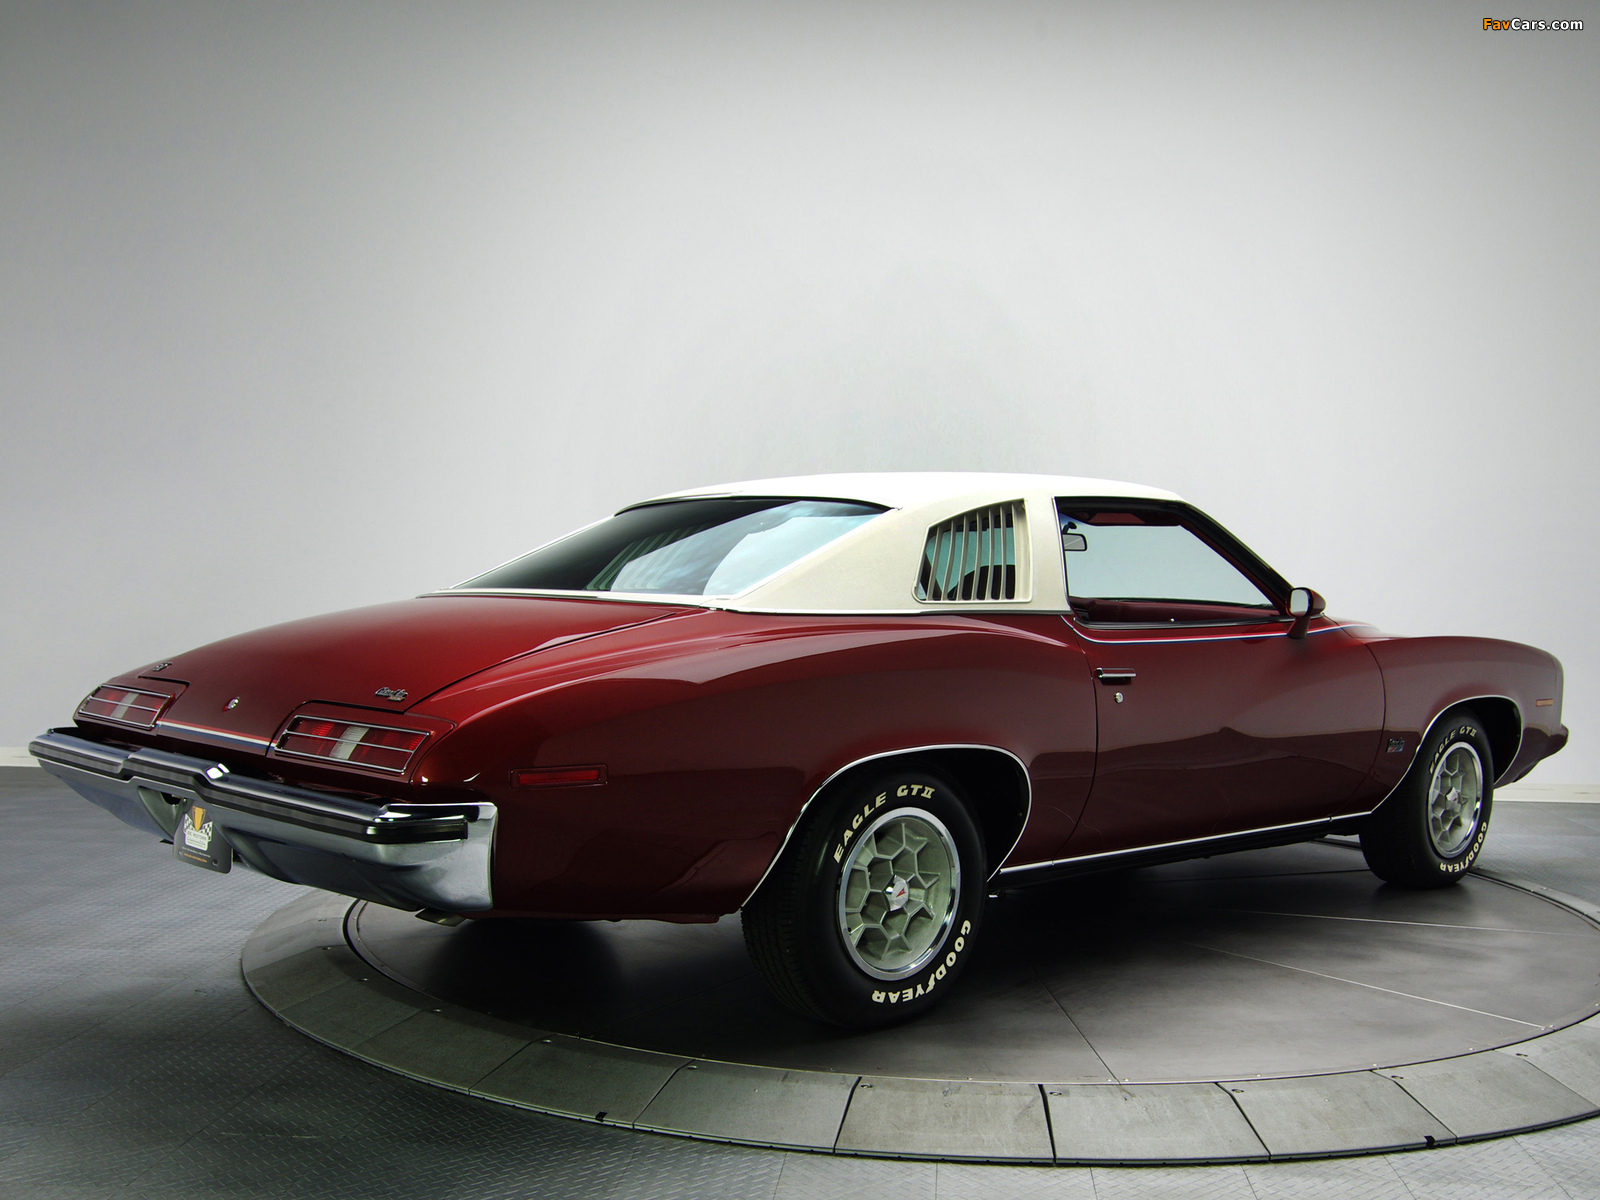 Pontiac Grand Am Solonnade Hardtop Coupe (H37) 1973 pictures (1600 x 1200)